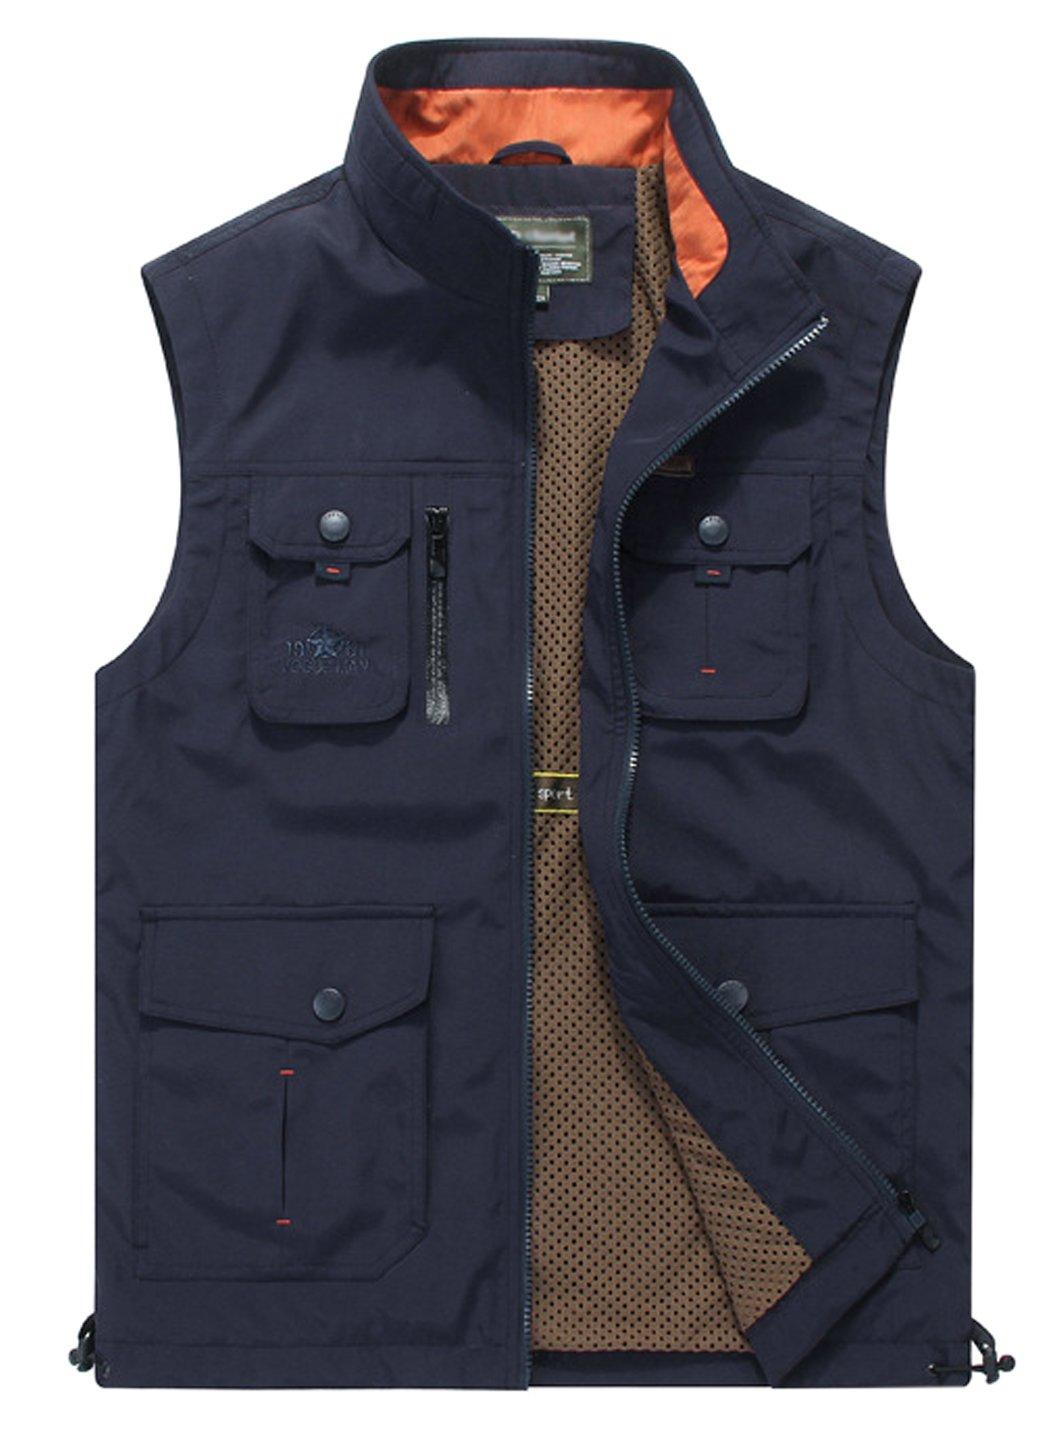 Gihuo Men's Utility Outdoor Multi Pockets Fishing Photo Journalist Sports Vest (Medium, Navy)